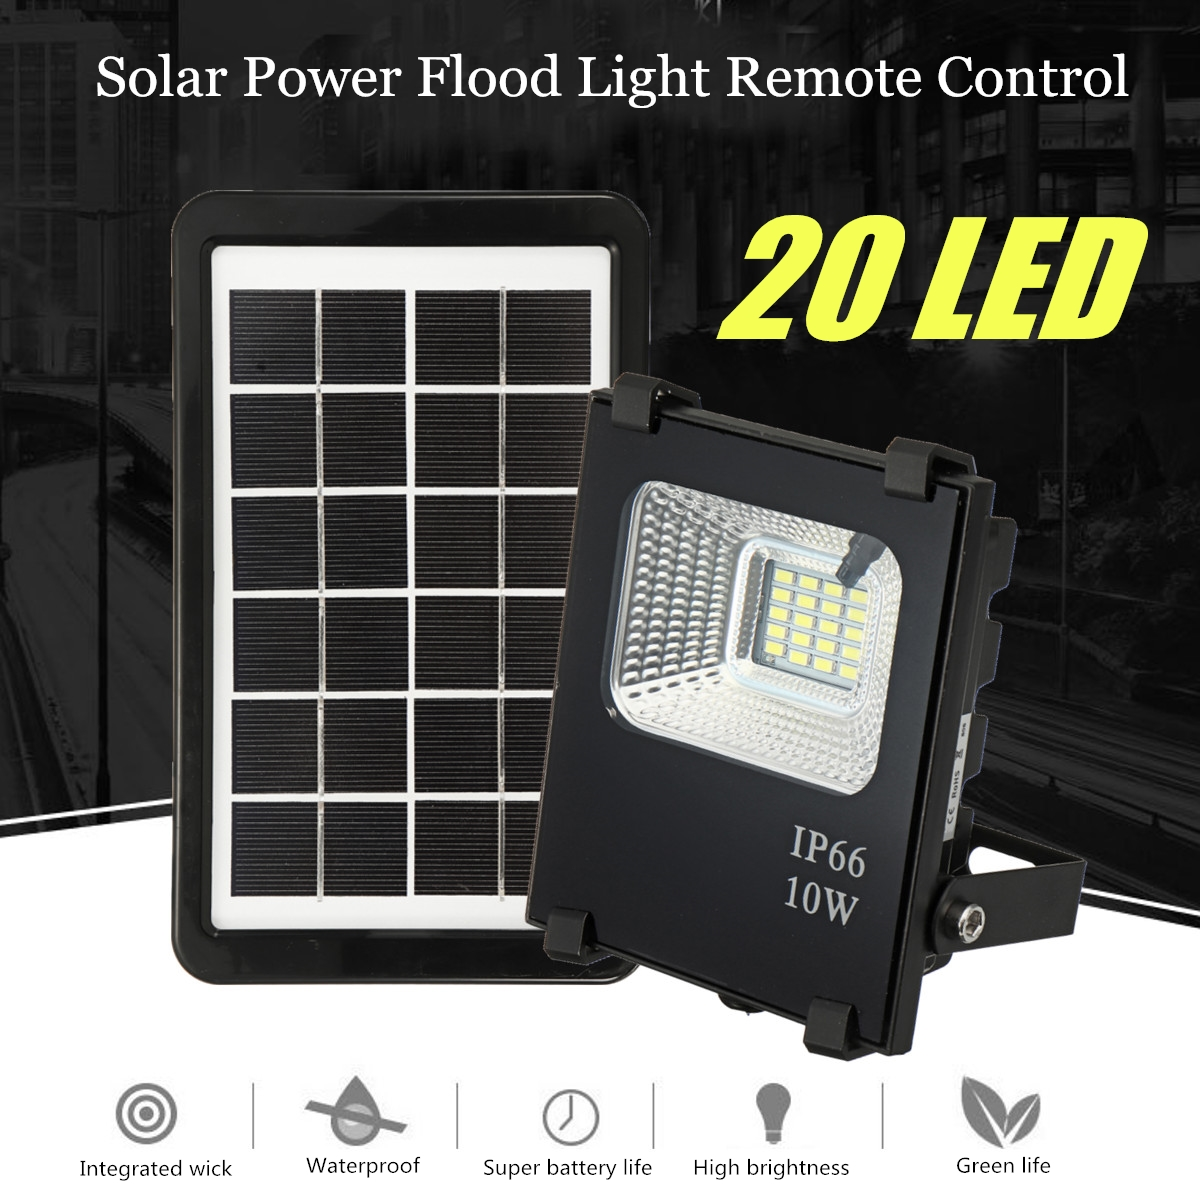 10w Solar Panels Plastic Frame 3w 20led Waterproof Lamp Panel Jet Iii Pro St Led Flashlight Broad Voltage Circuit Cree R5 Remote Optically Control